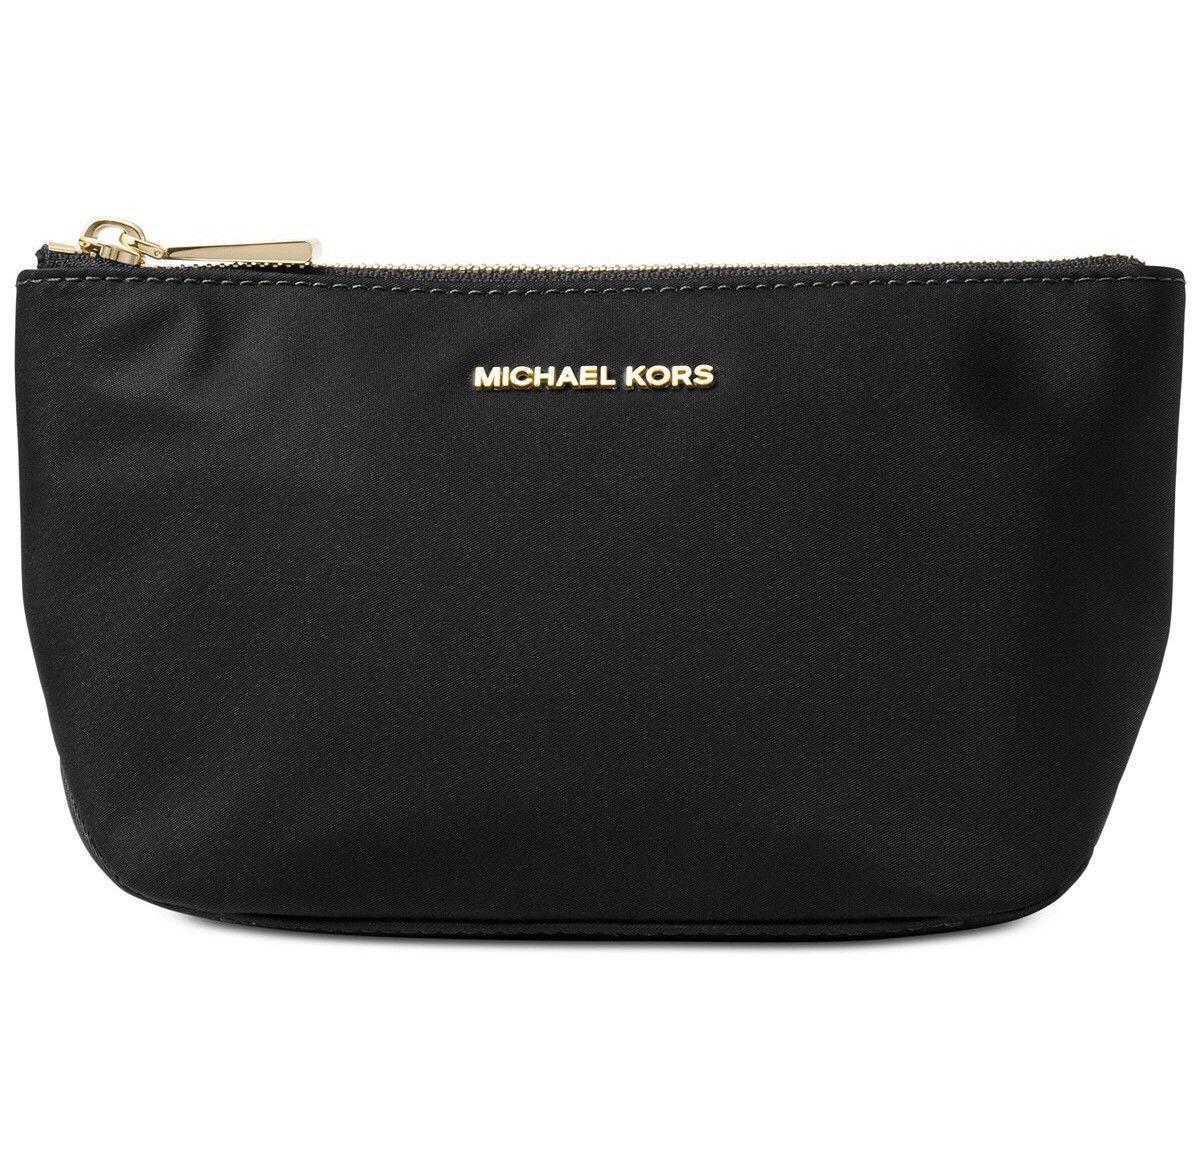 Michael Kors Penny Medium Travel Pouch Cosmetics Makeup Black 32f7gp4t2c